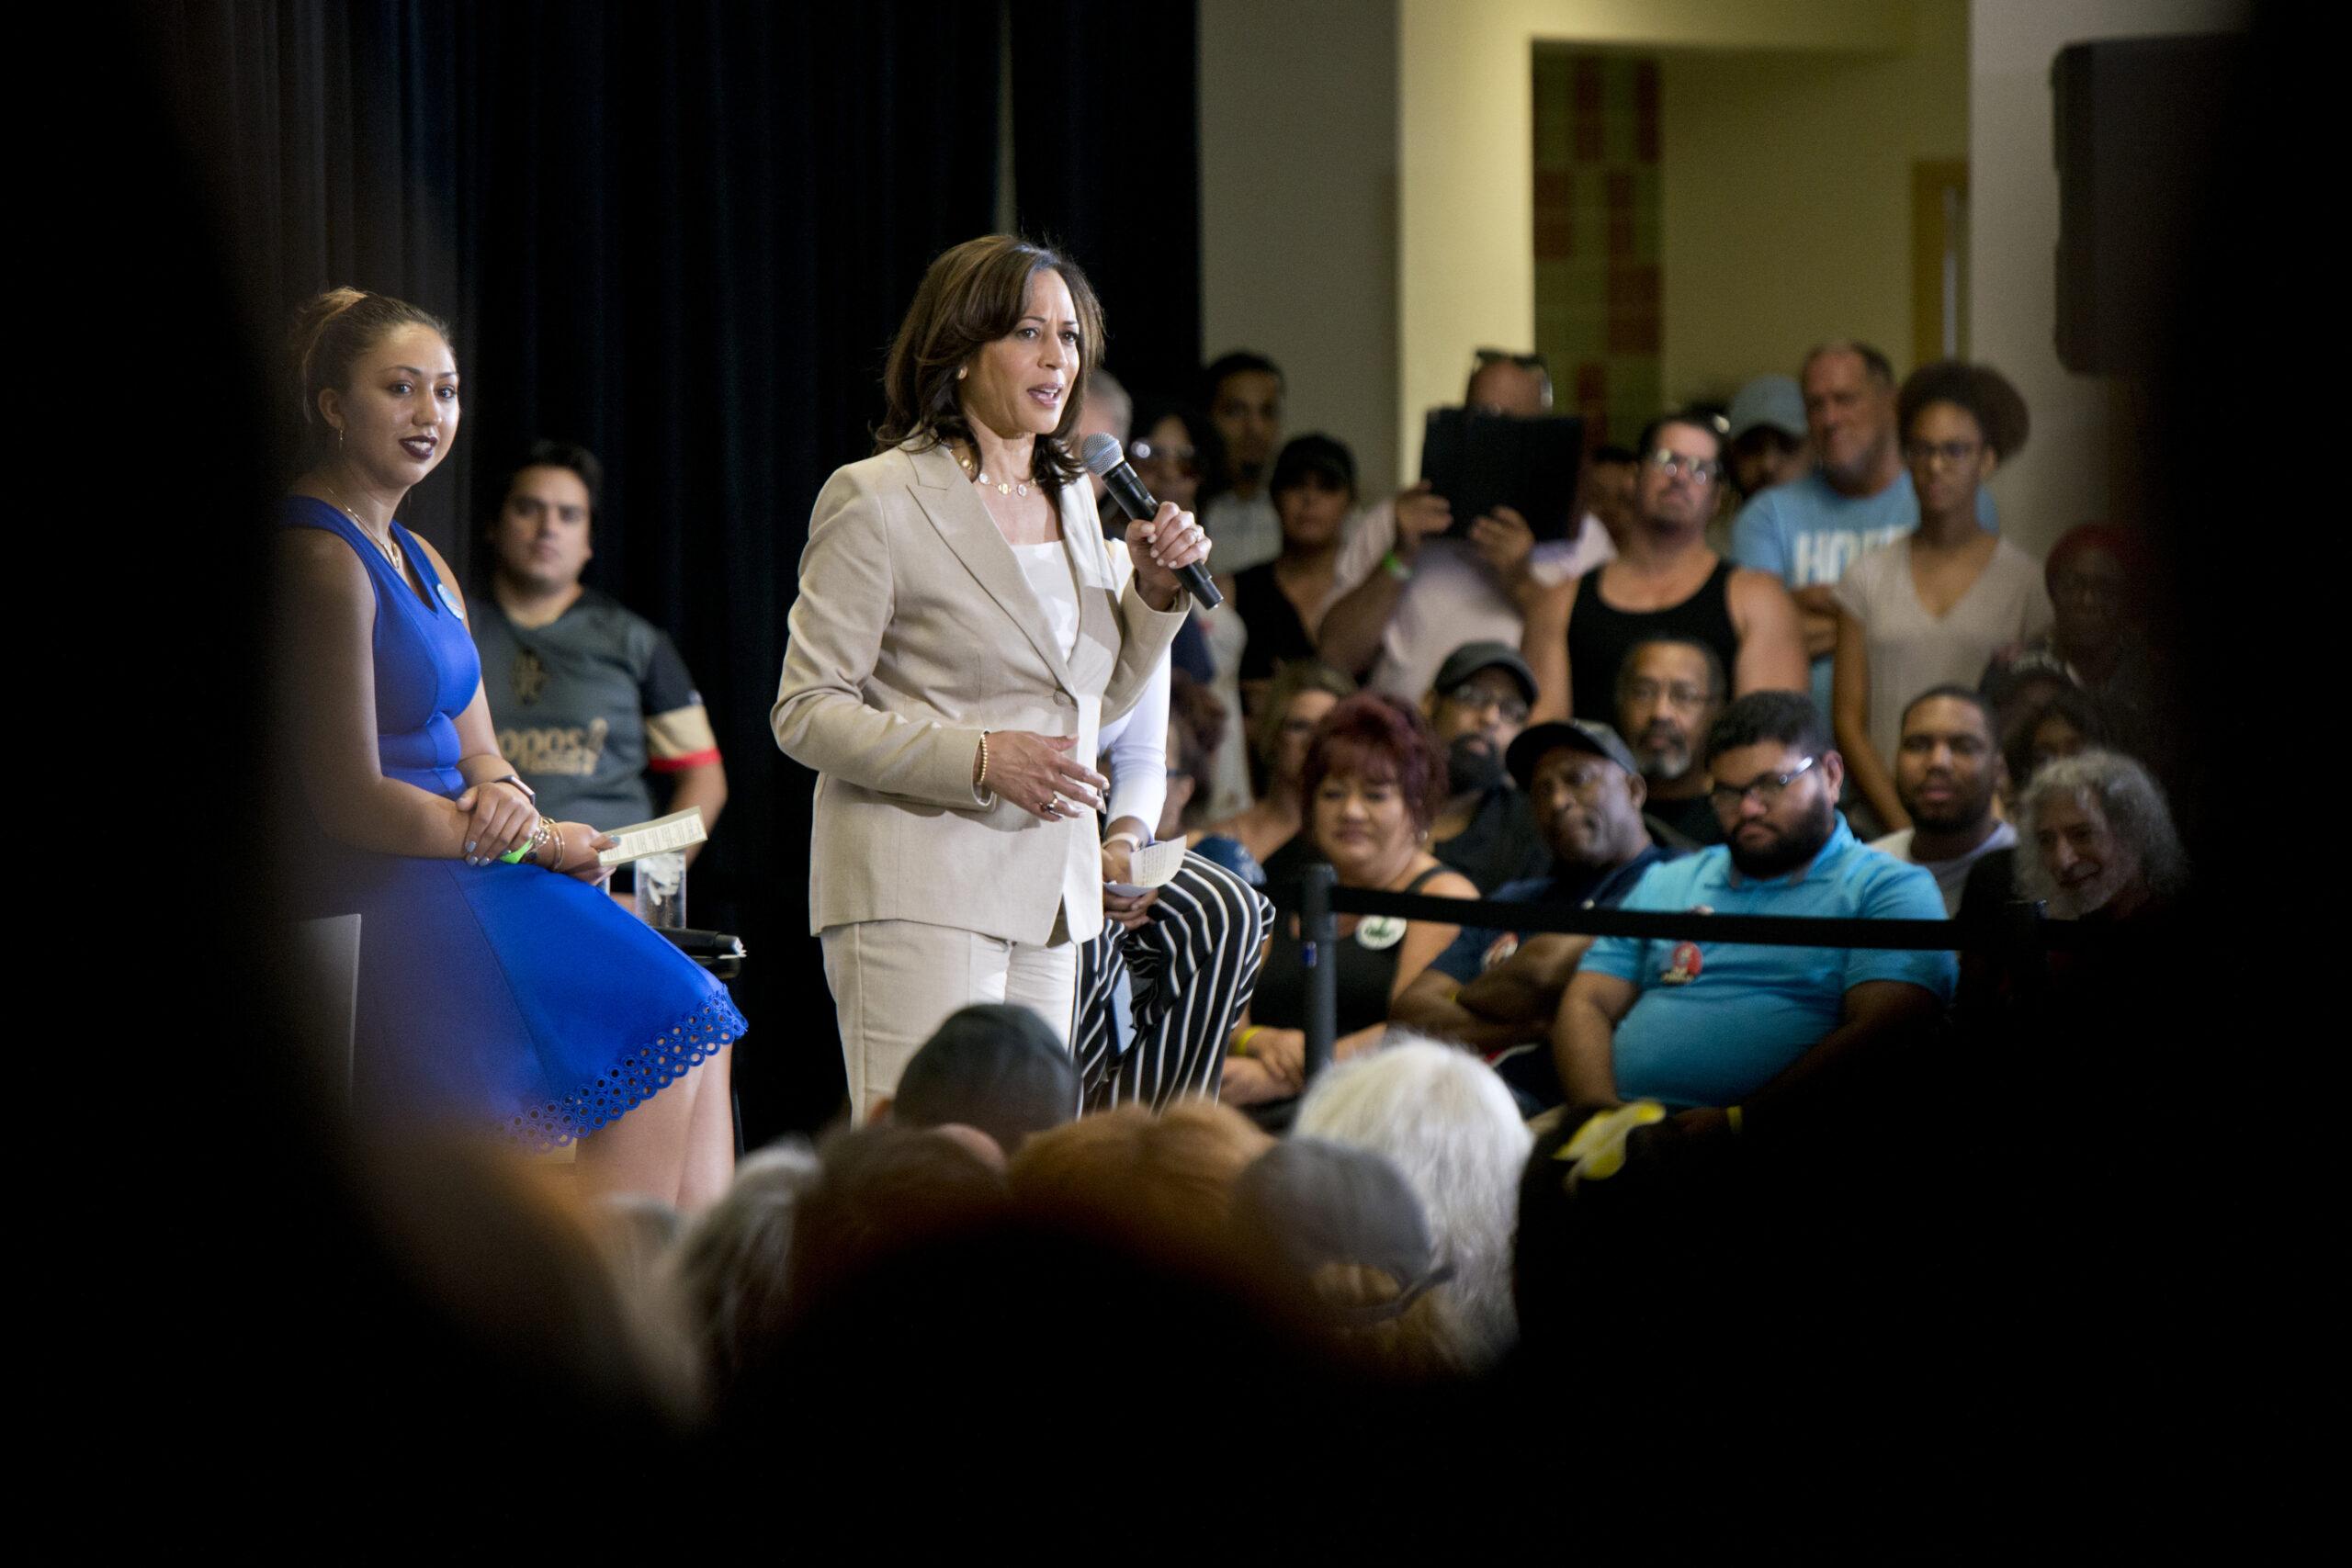 Sen. Kamala Harris speaks during a campaign event